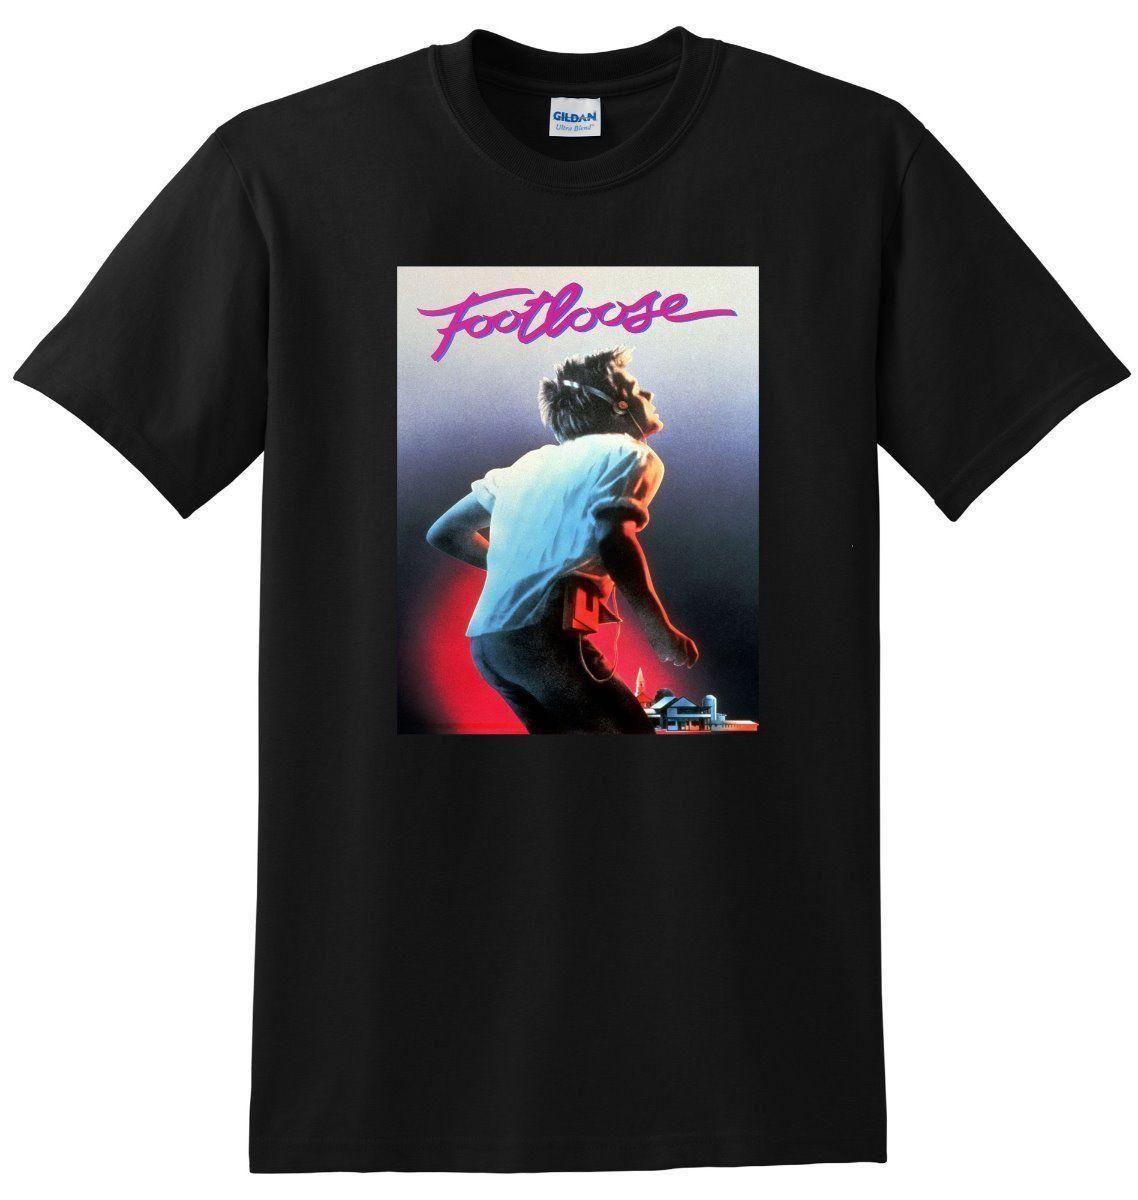 fb4728e9976 FOOTLOOSE T SHIRT Bluray Dvd Poster Tee SMALL MEDIUM LARGE Or XL Tshirt  Designs T Shirt Design Template From Linnan009